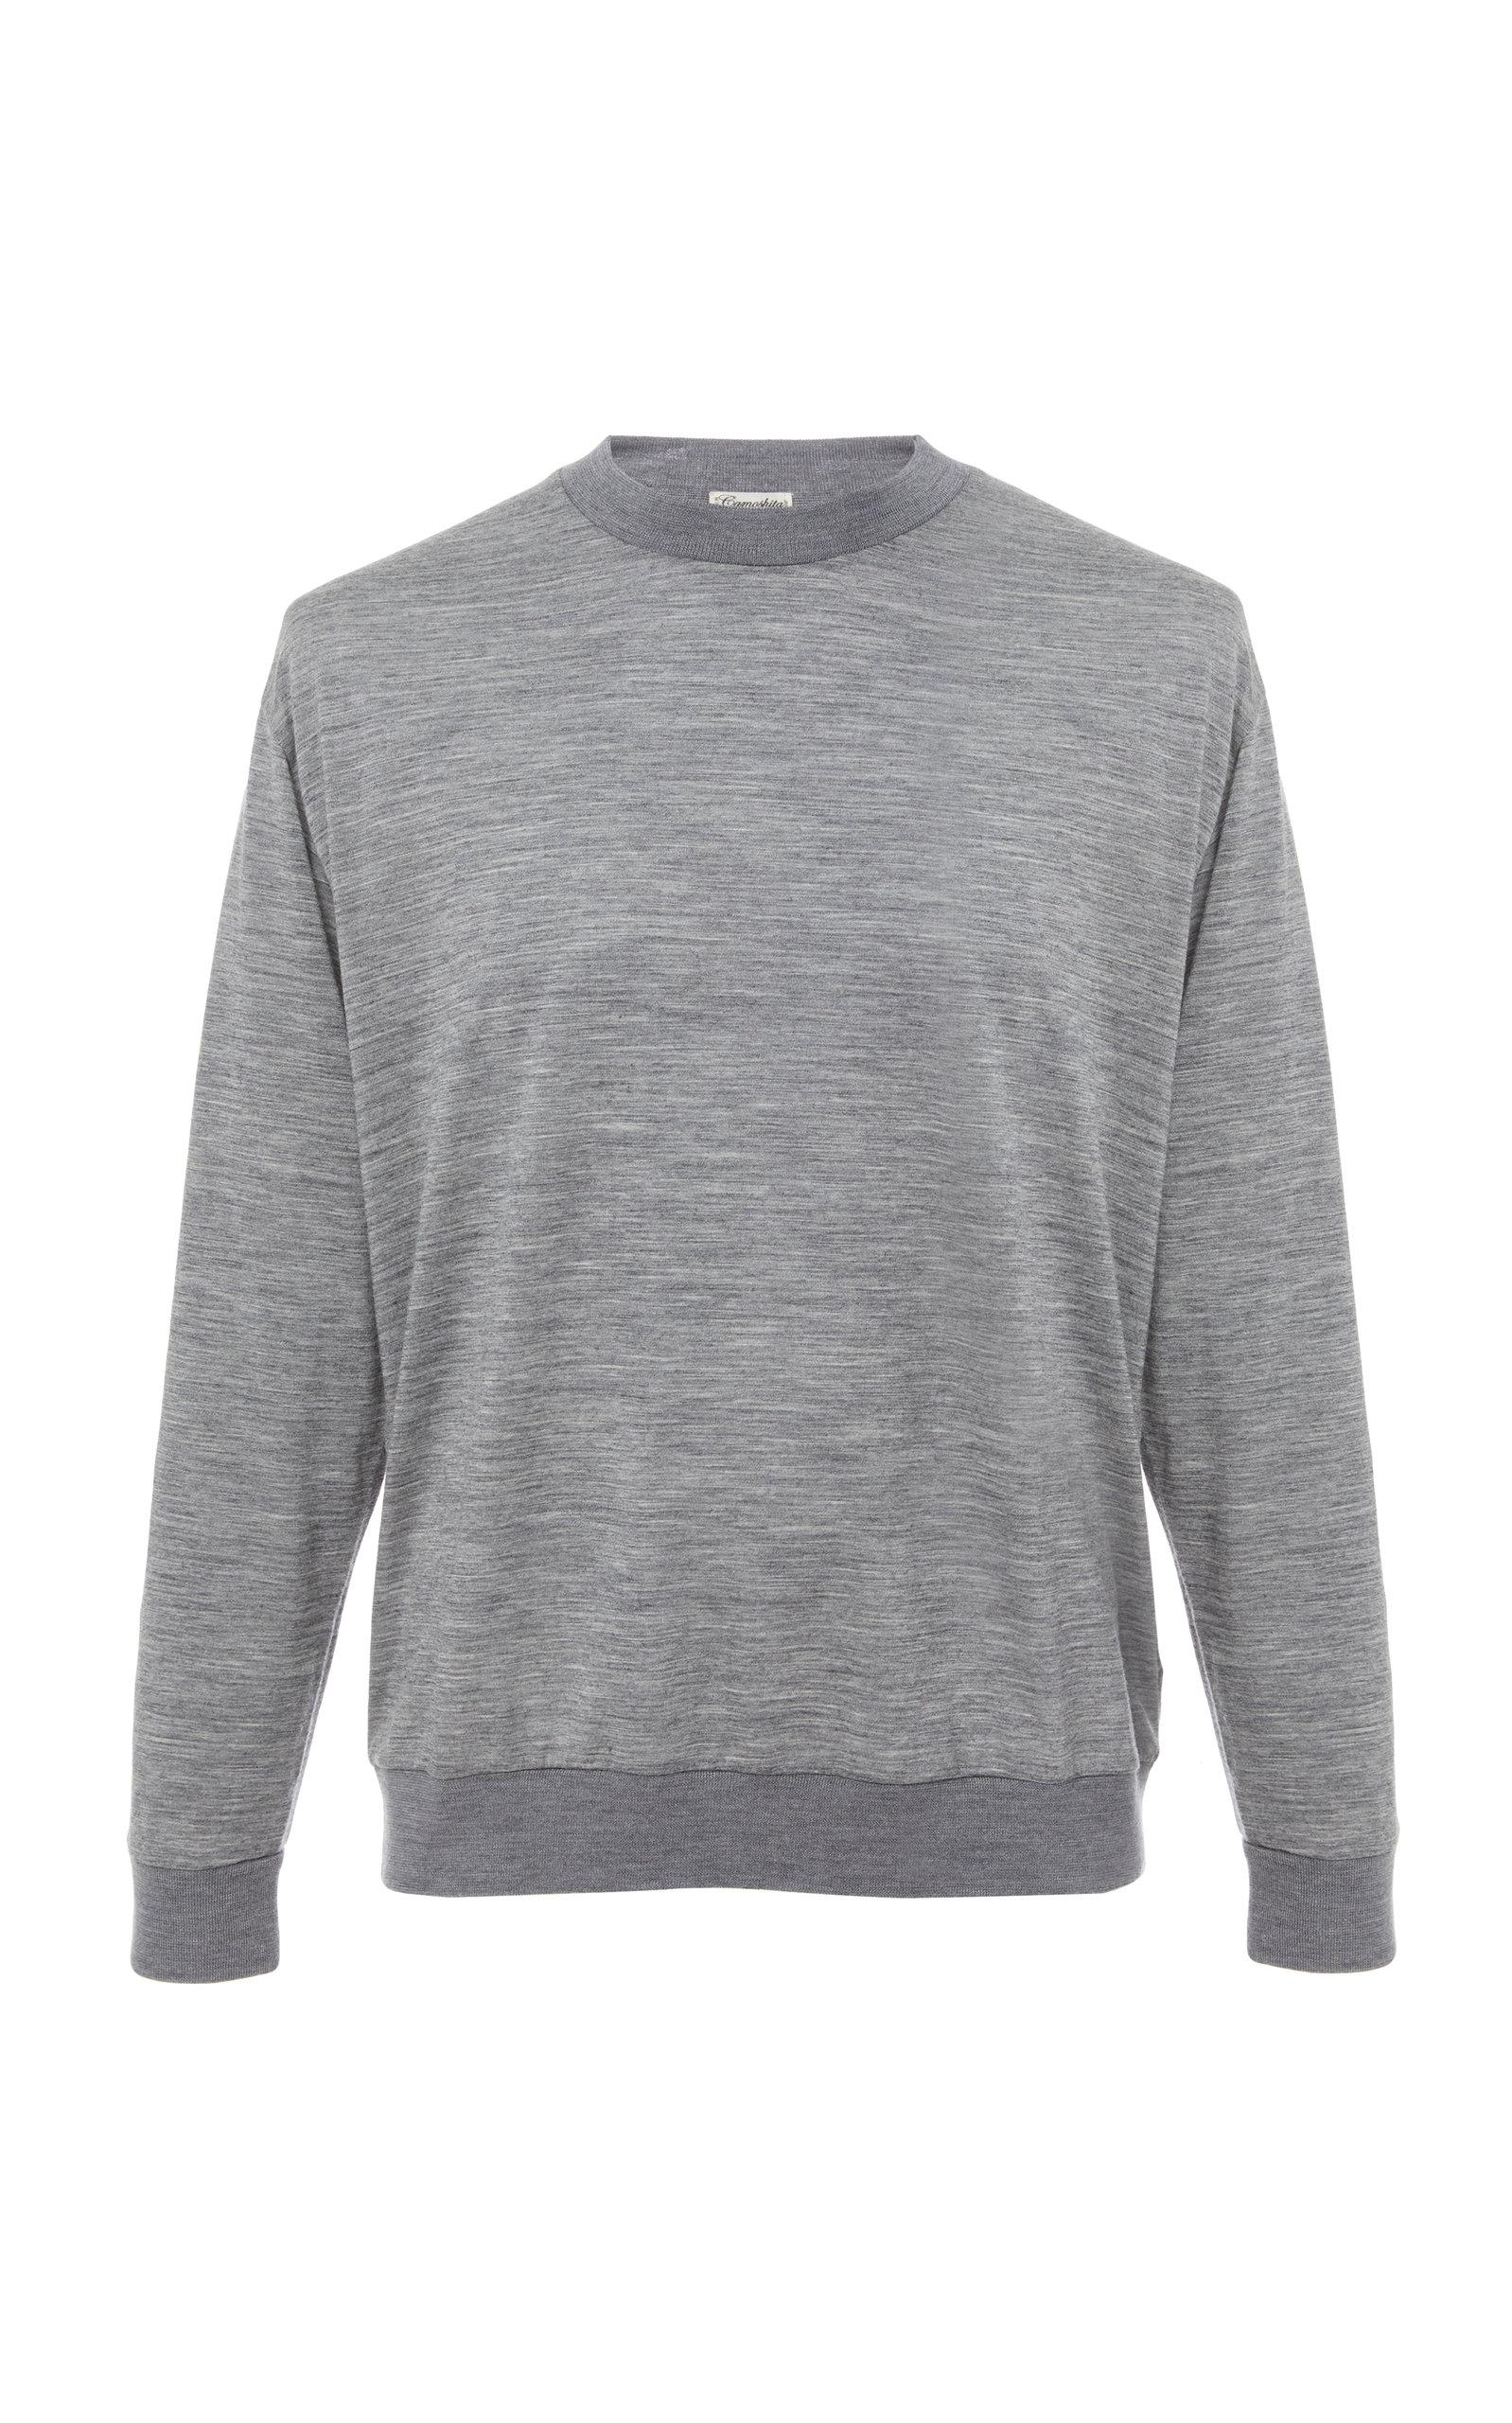 CAMOSHITA Long Sleeve Wool Shirt in Grey